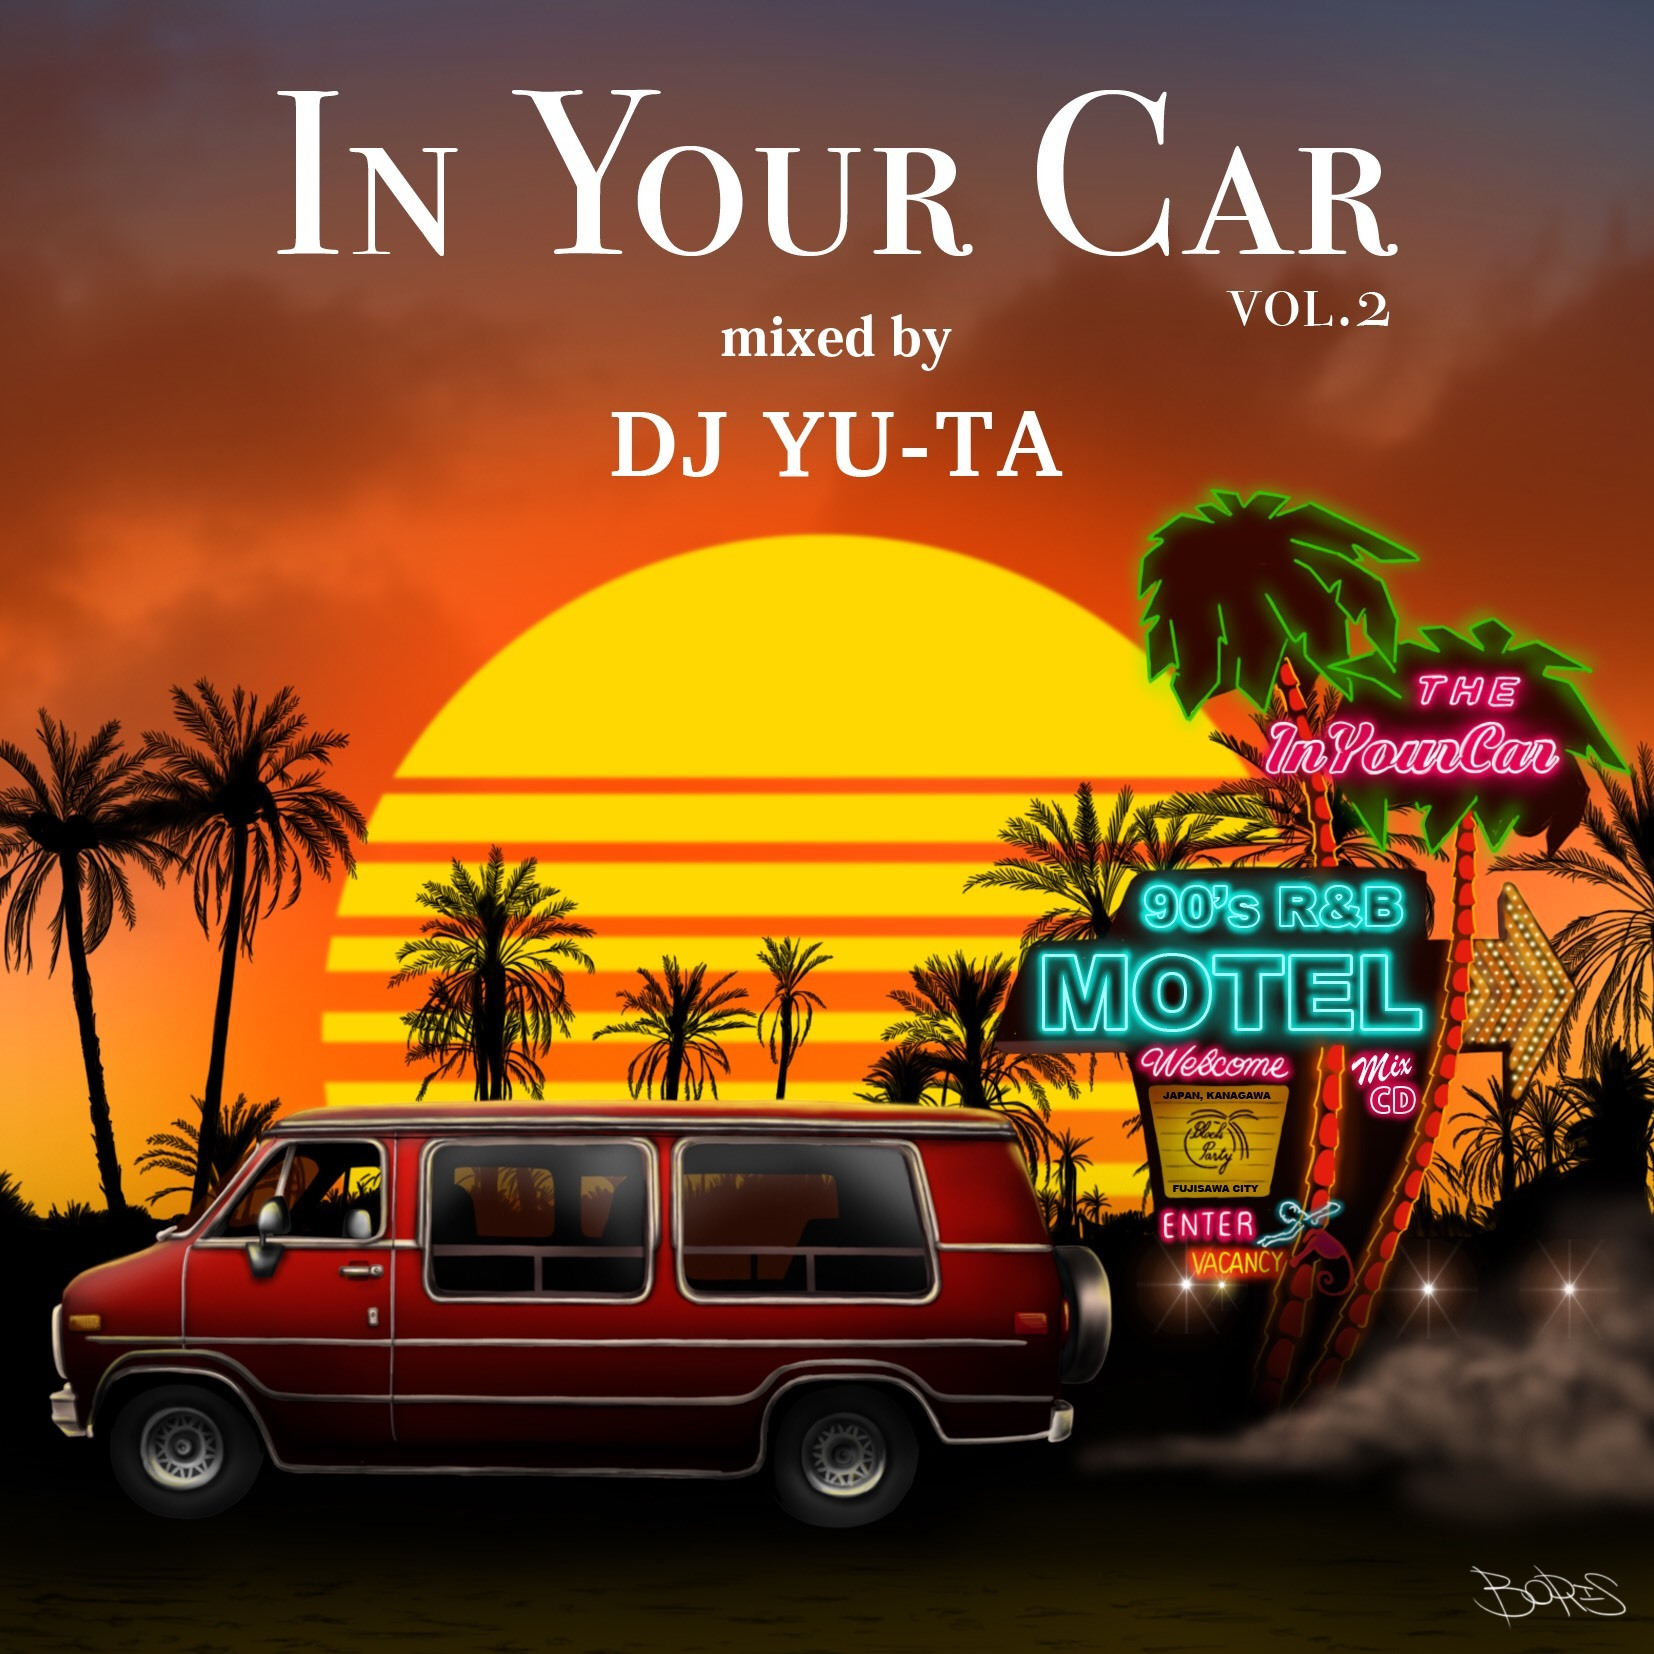 [MIX CD] DJ YU-TA / IN YOUR CAR Vol.2